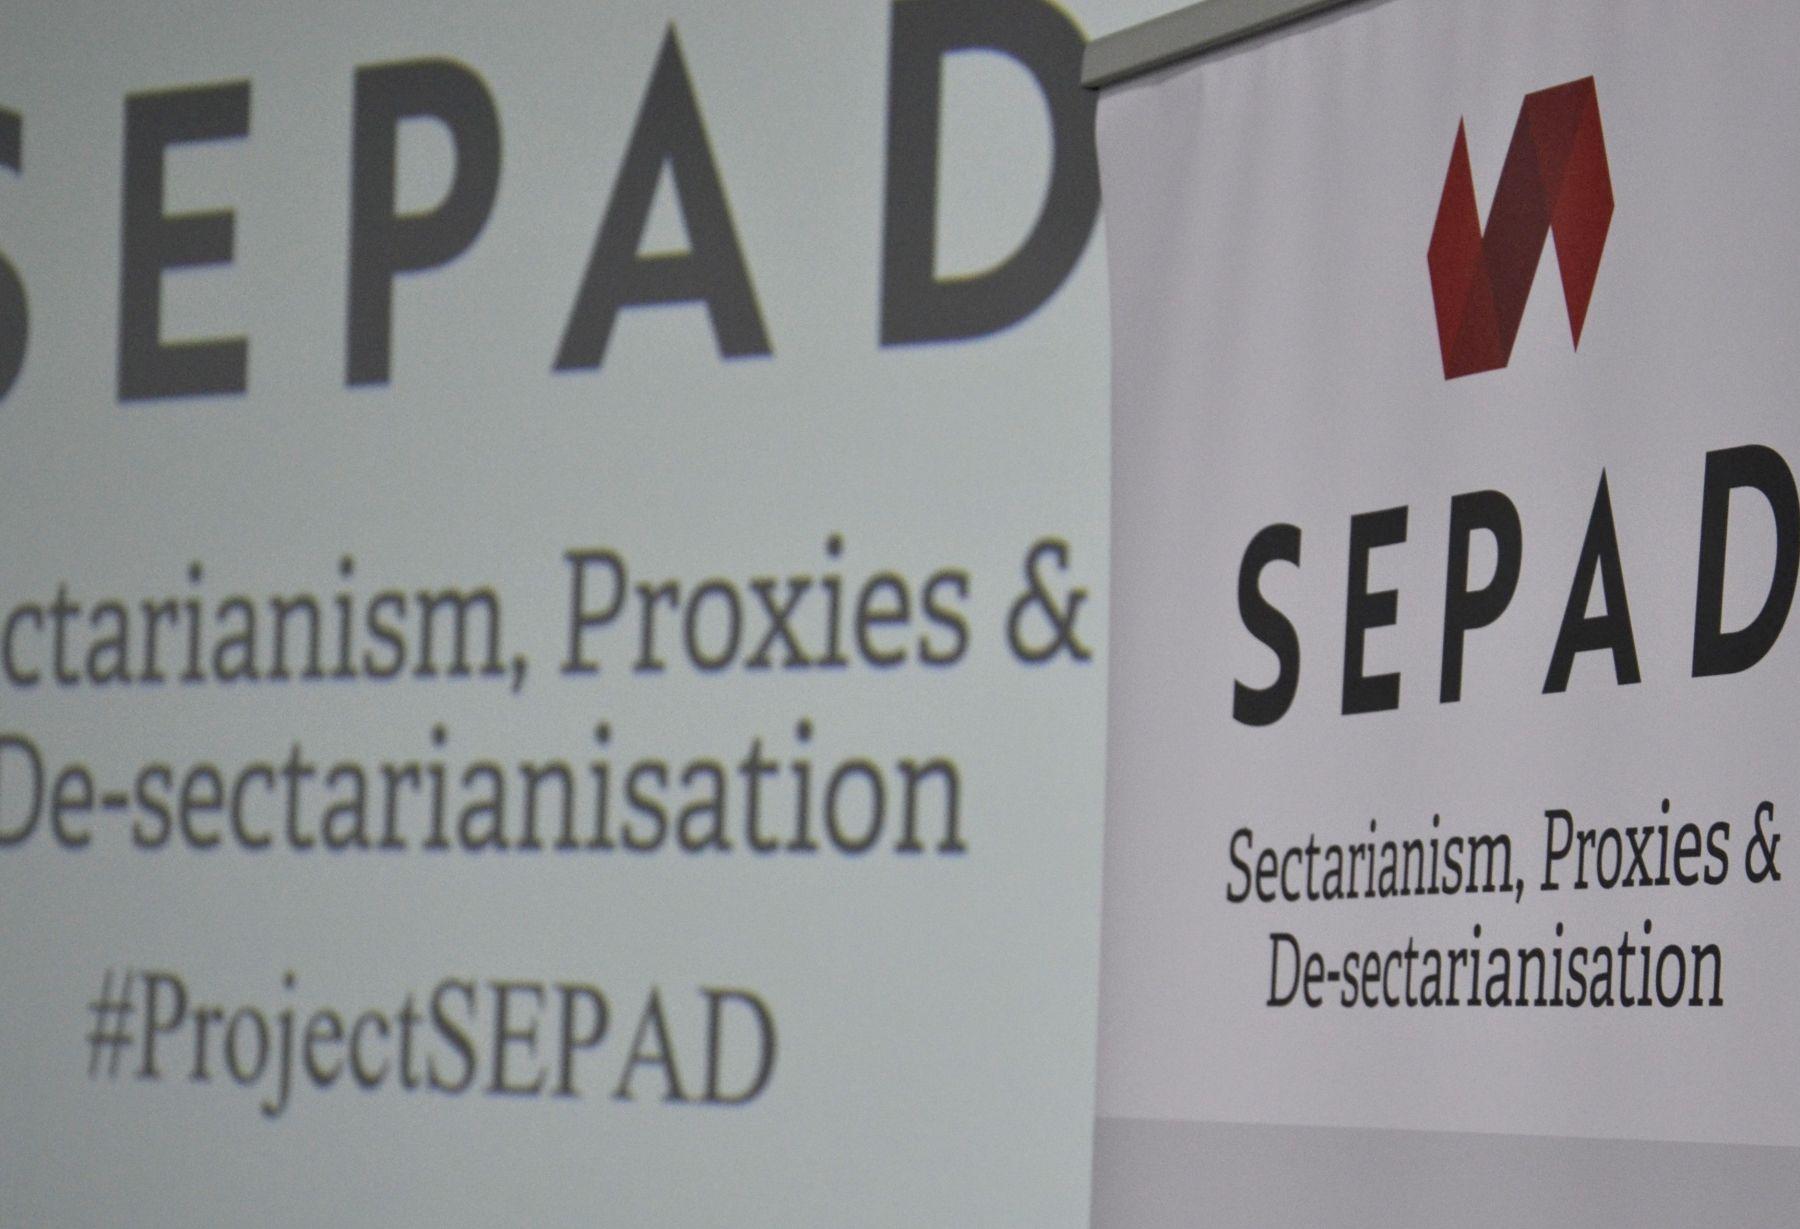 De-sectarianization event